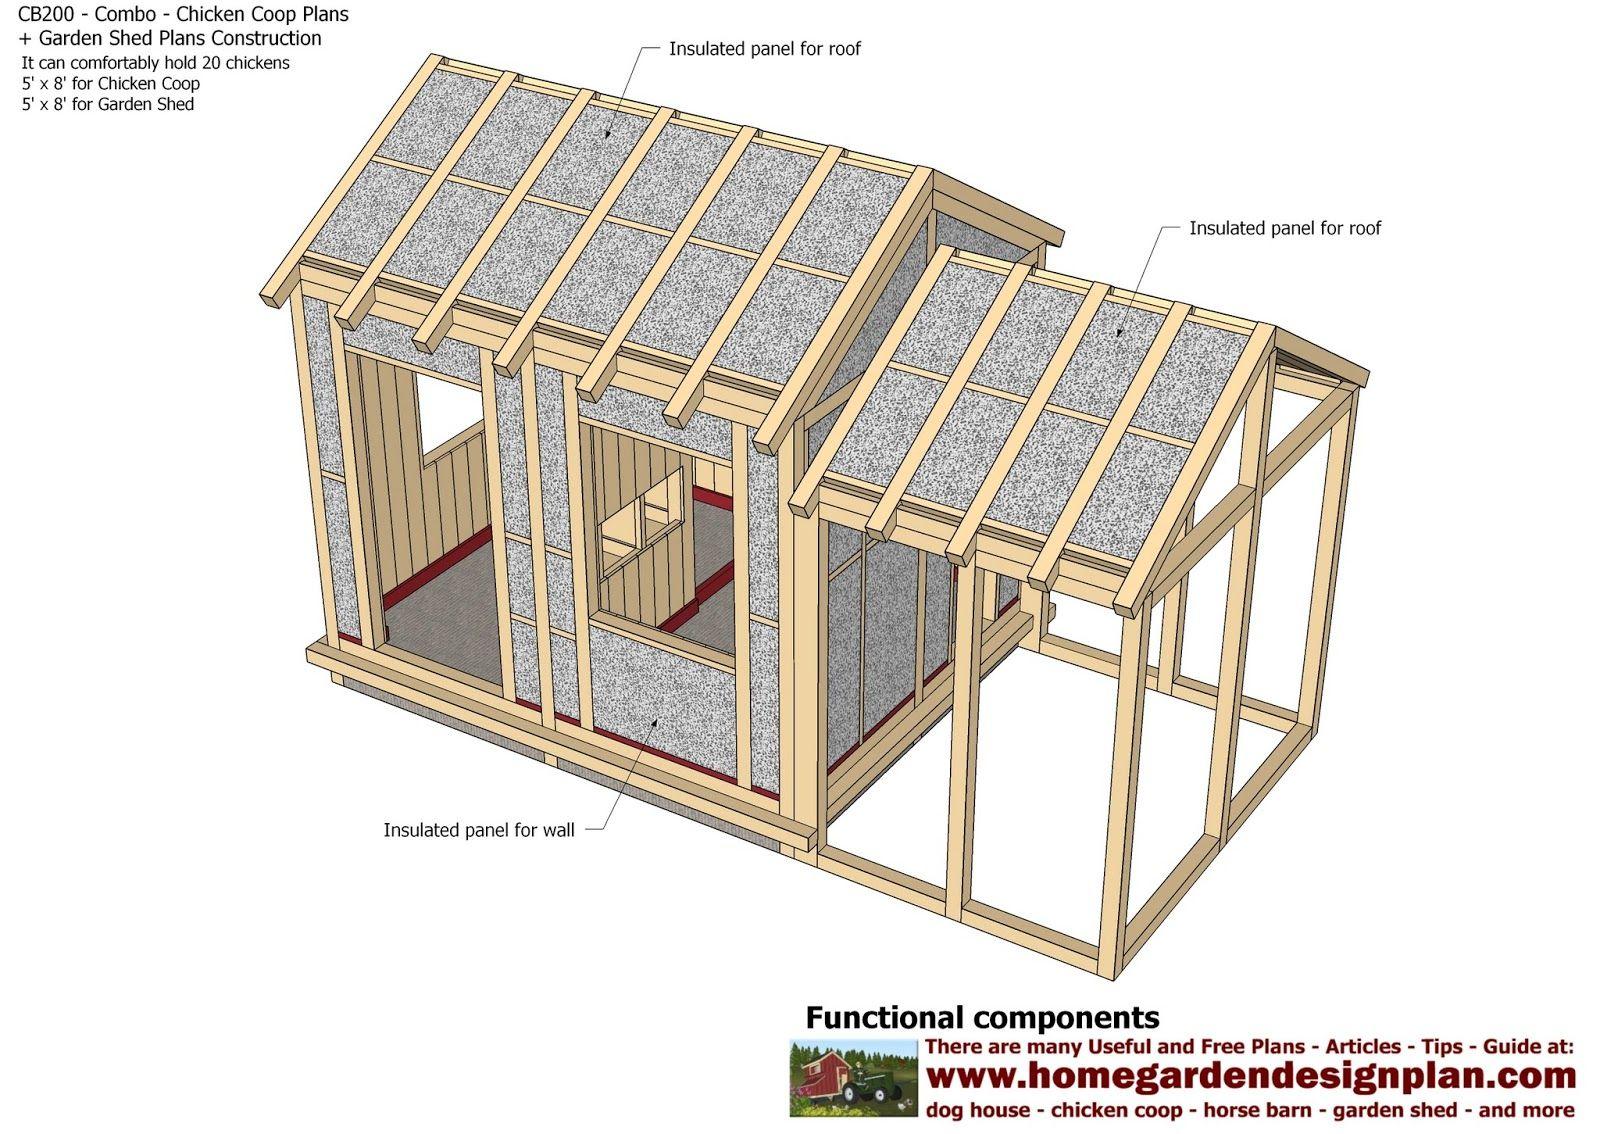 Home Garden Plans Cb200 Combo En Coop Construction Sheds